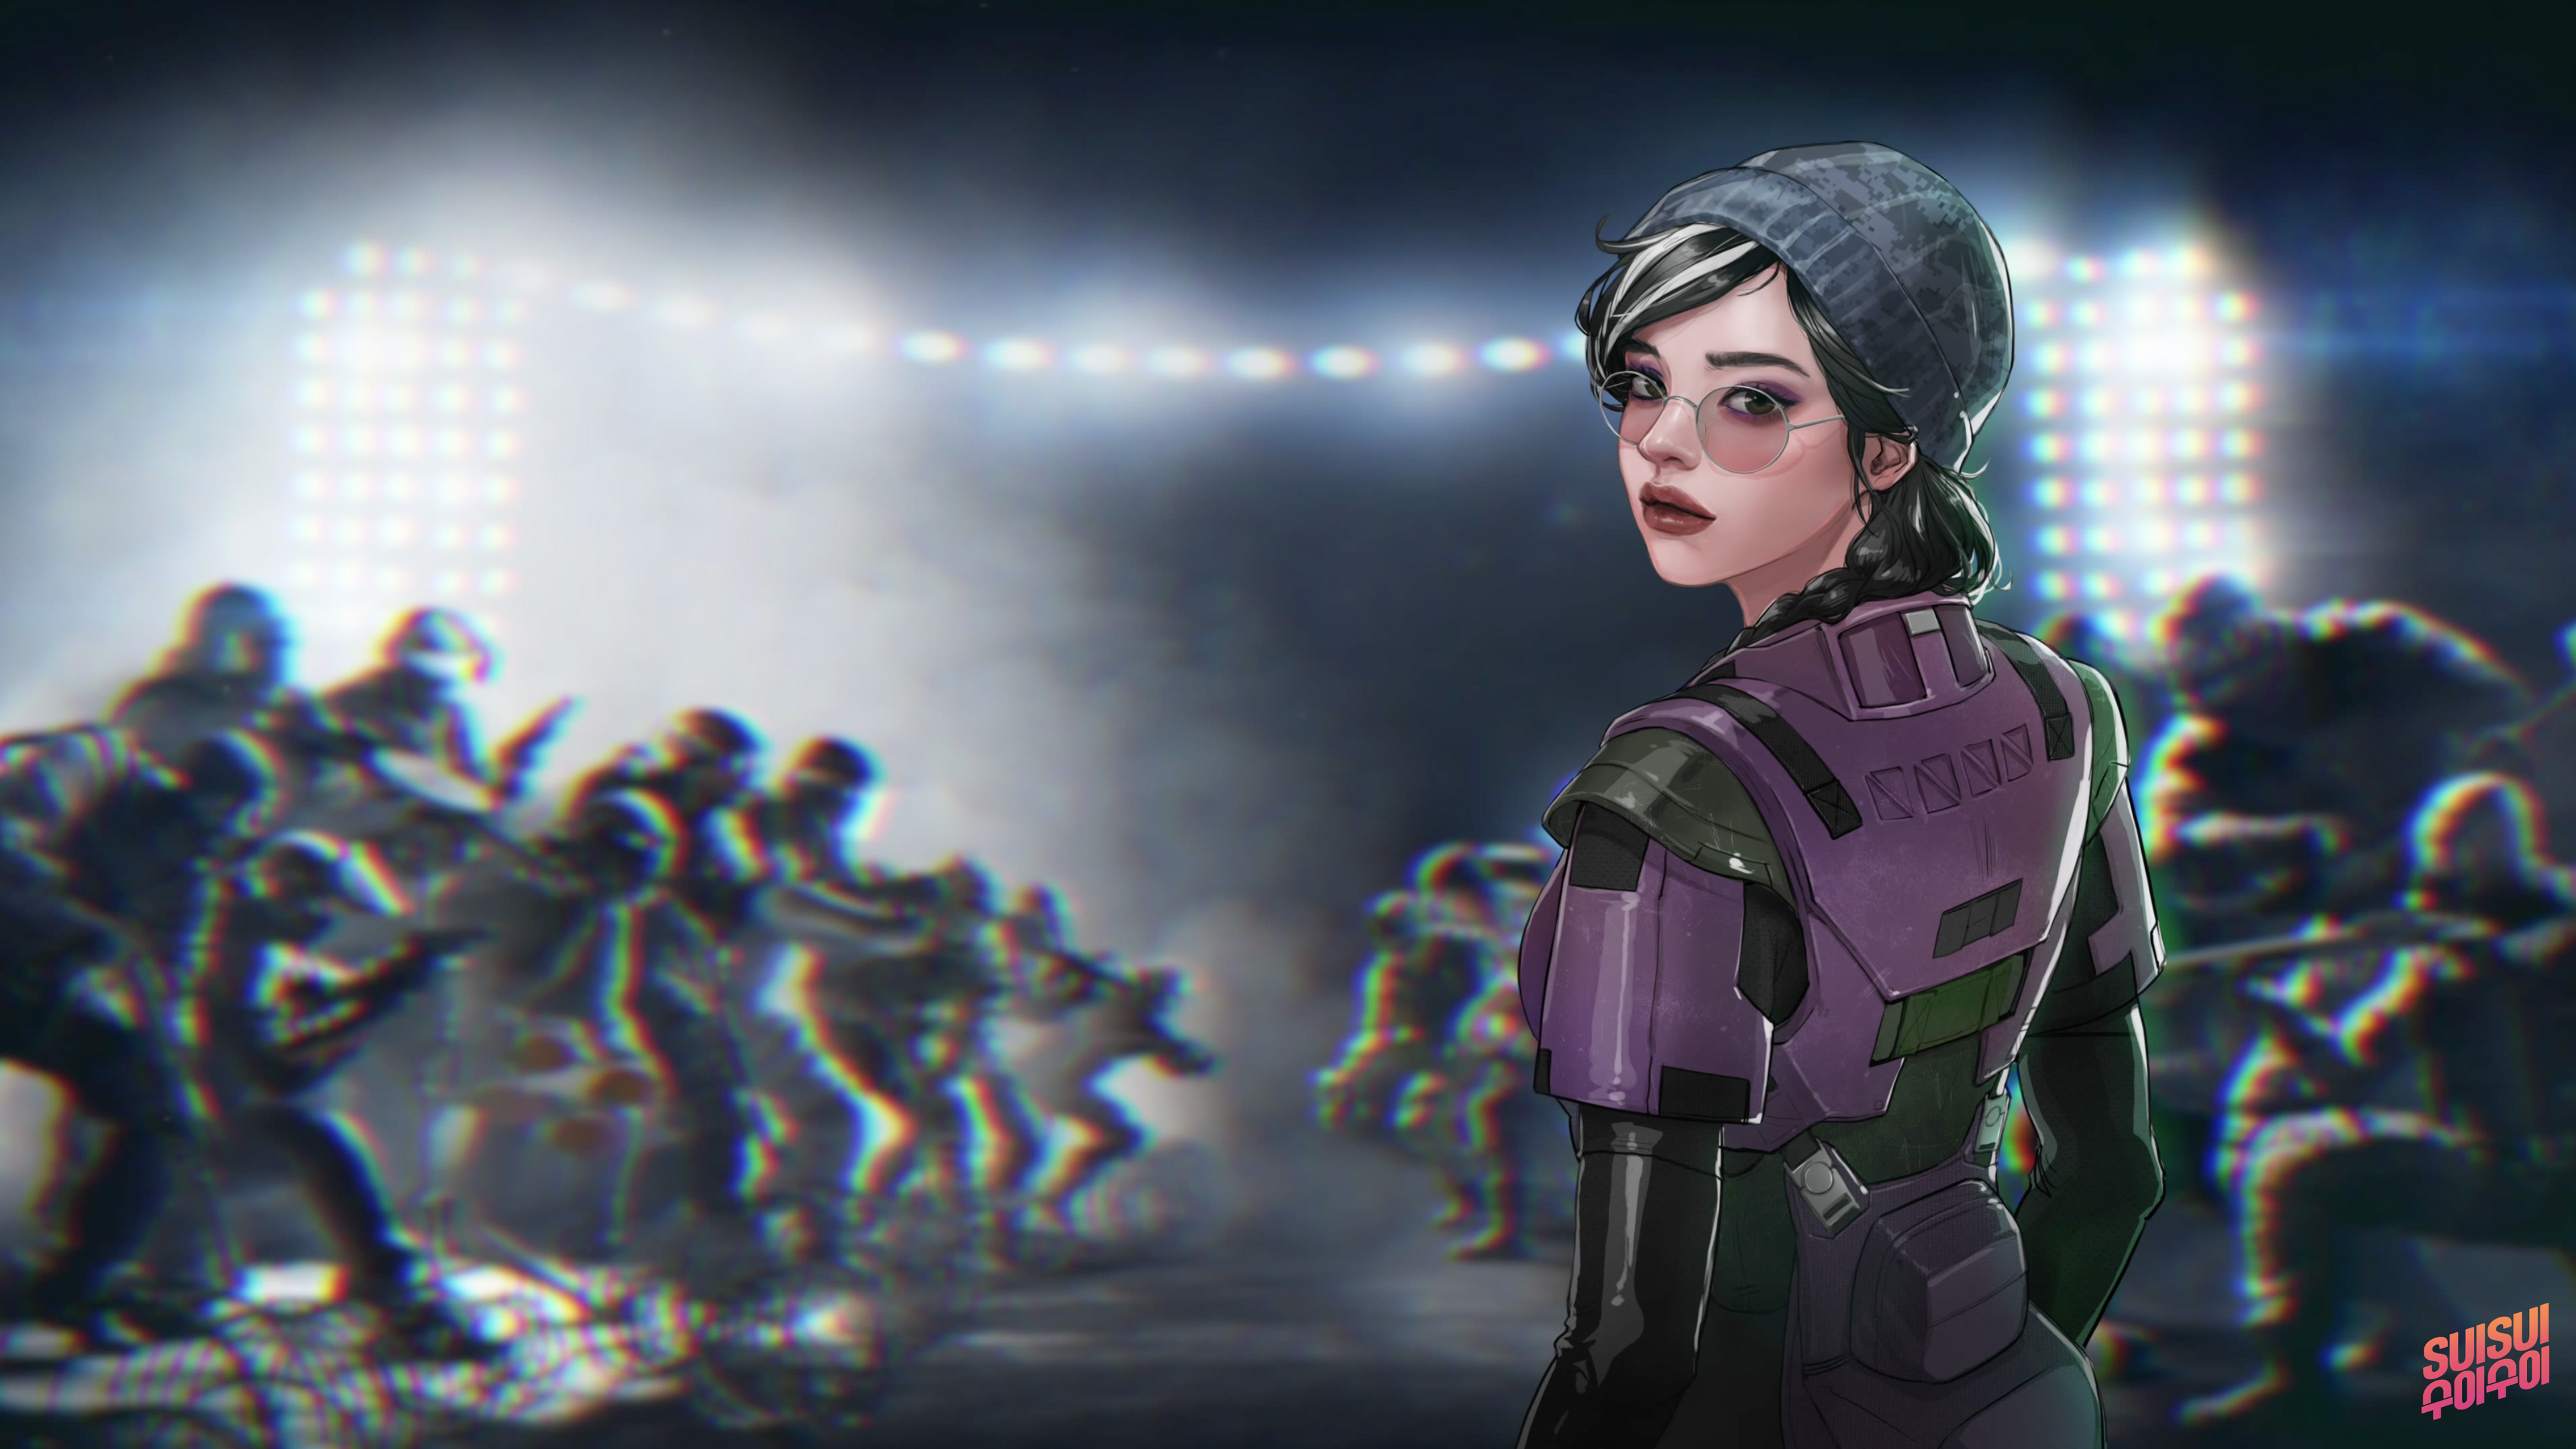 Rainbow Six Siege Wallpaper 4k: Rainbow Six Siege Dokkaebi Artwork 4k, HD Games, 4k